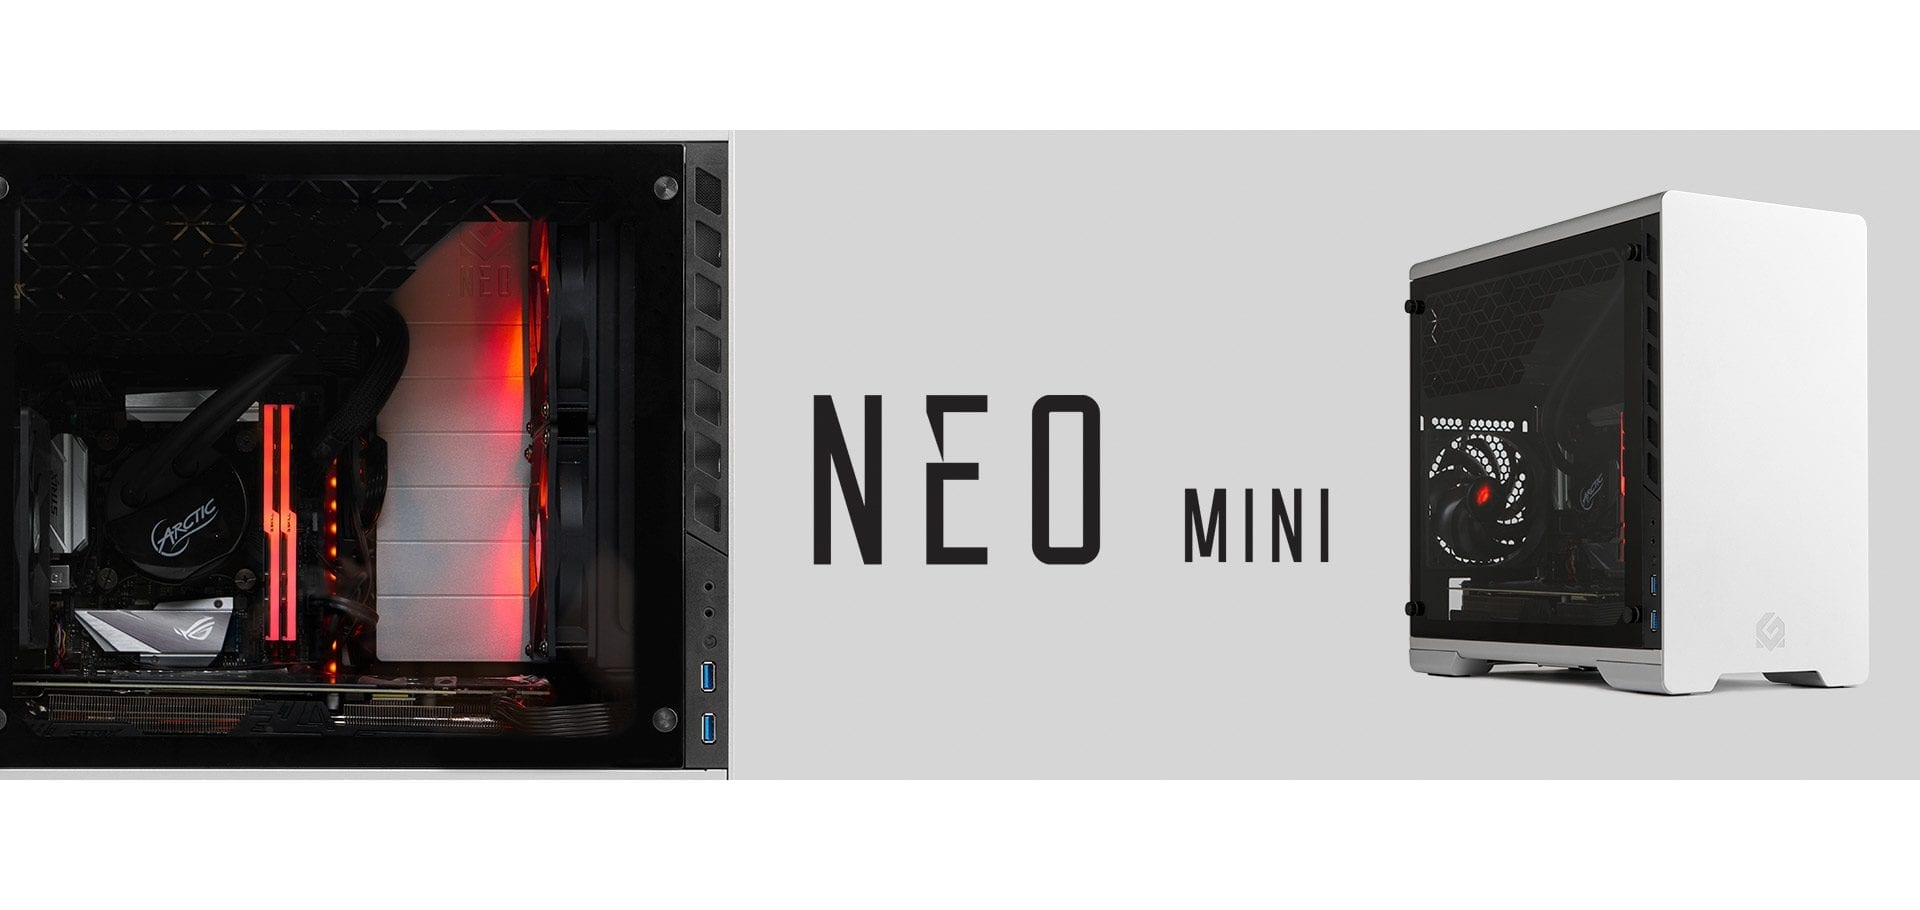 Neo_Miniw